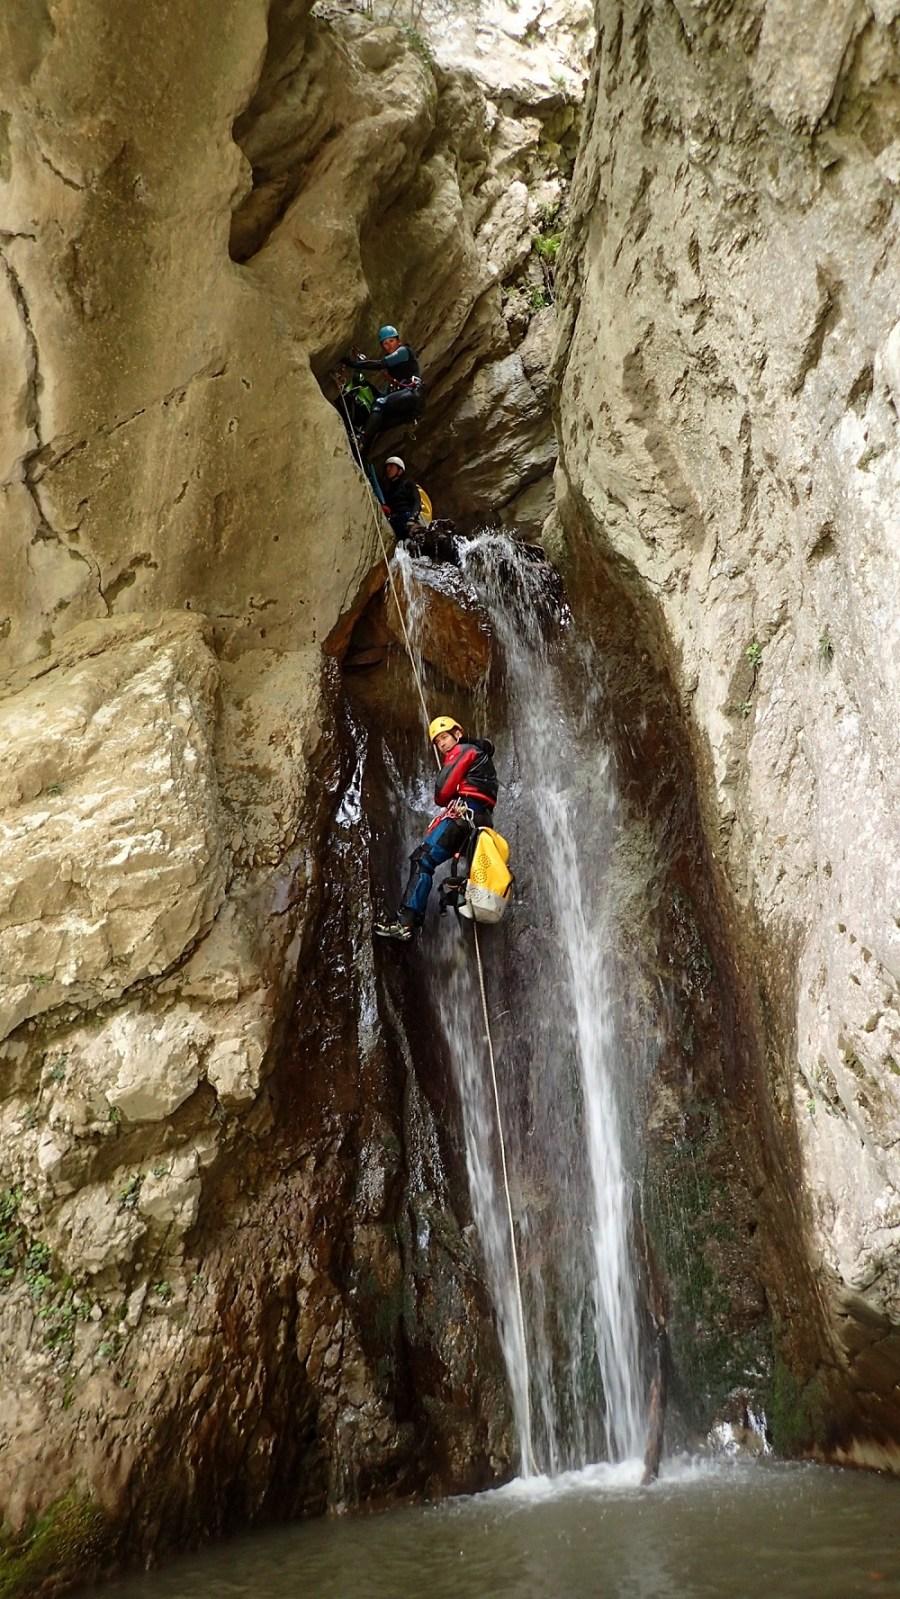 Canyon Errekaltia - Ur etaLur, Canyoning et Randonnée